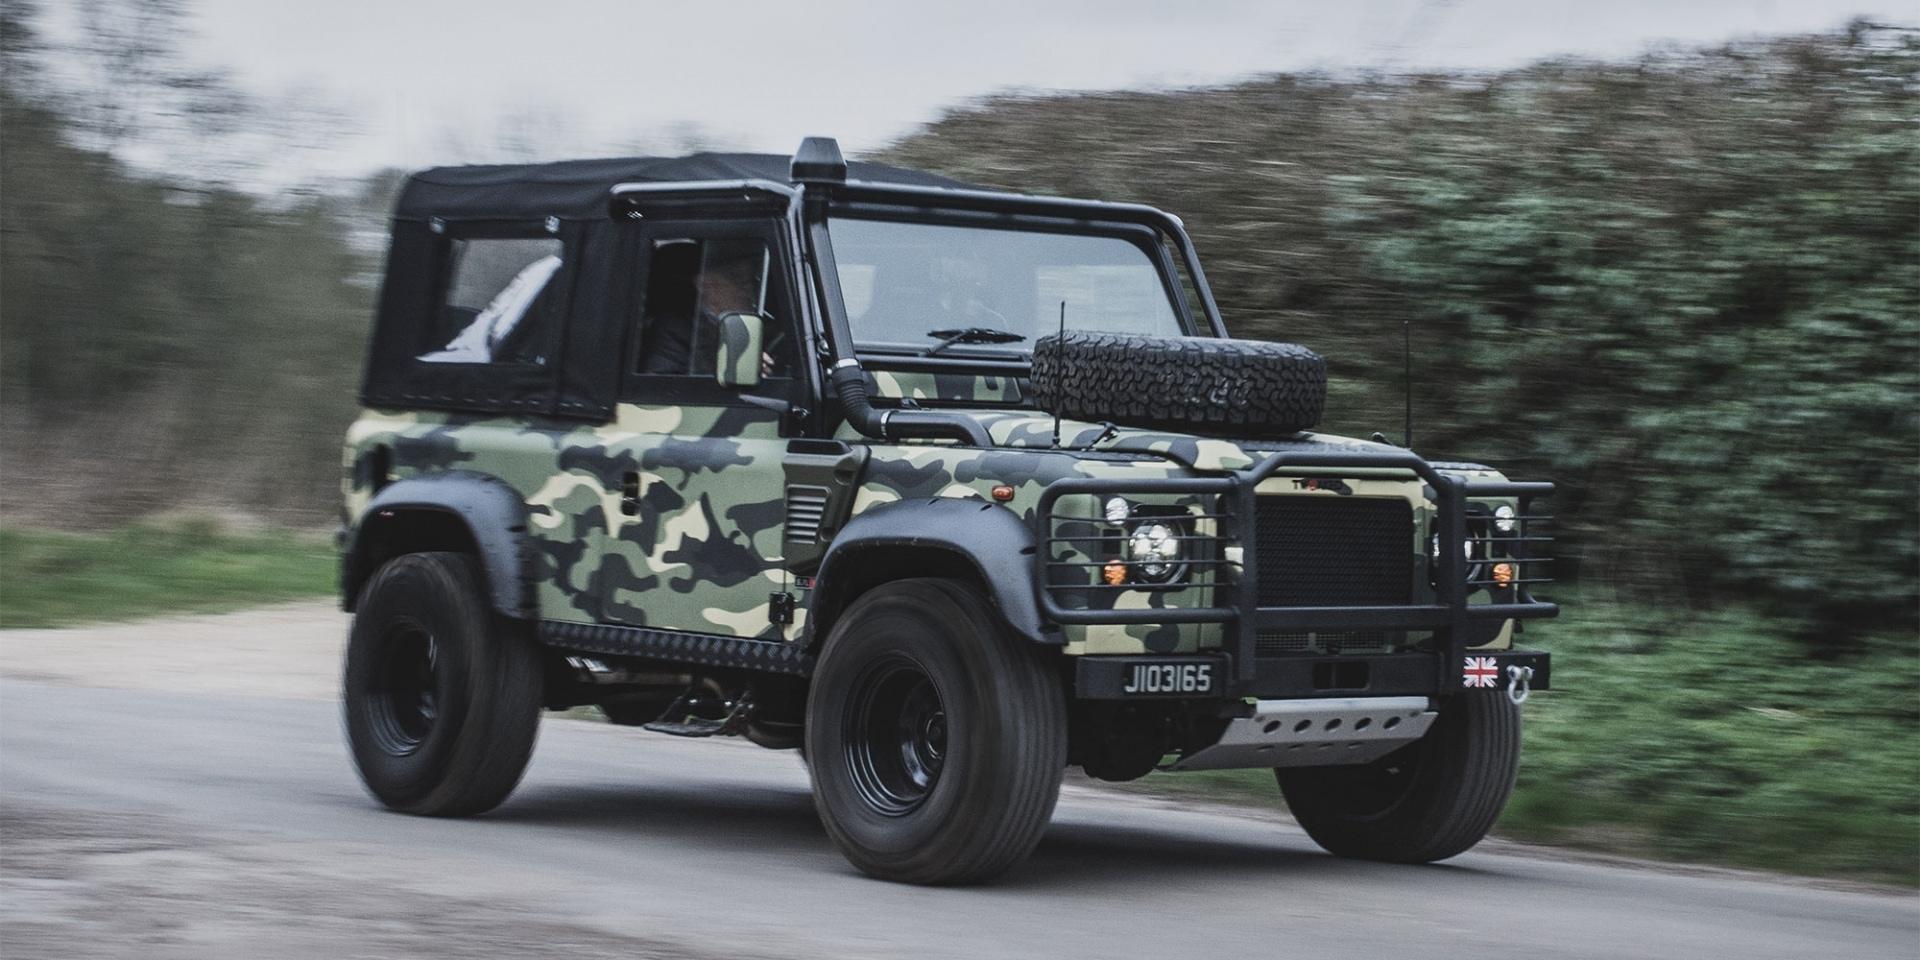 Tweaked Automotive重度改造,Land Rover Defender軍裝特仕版